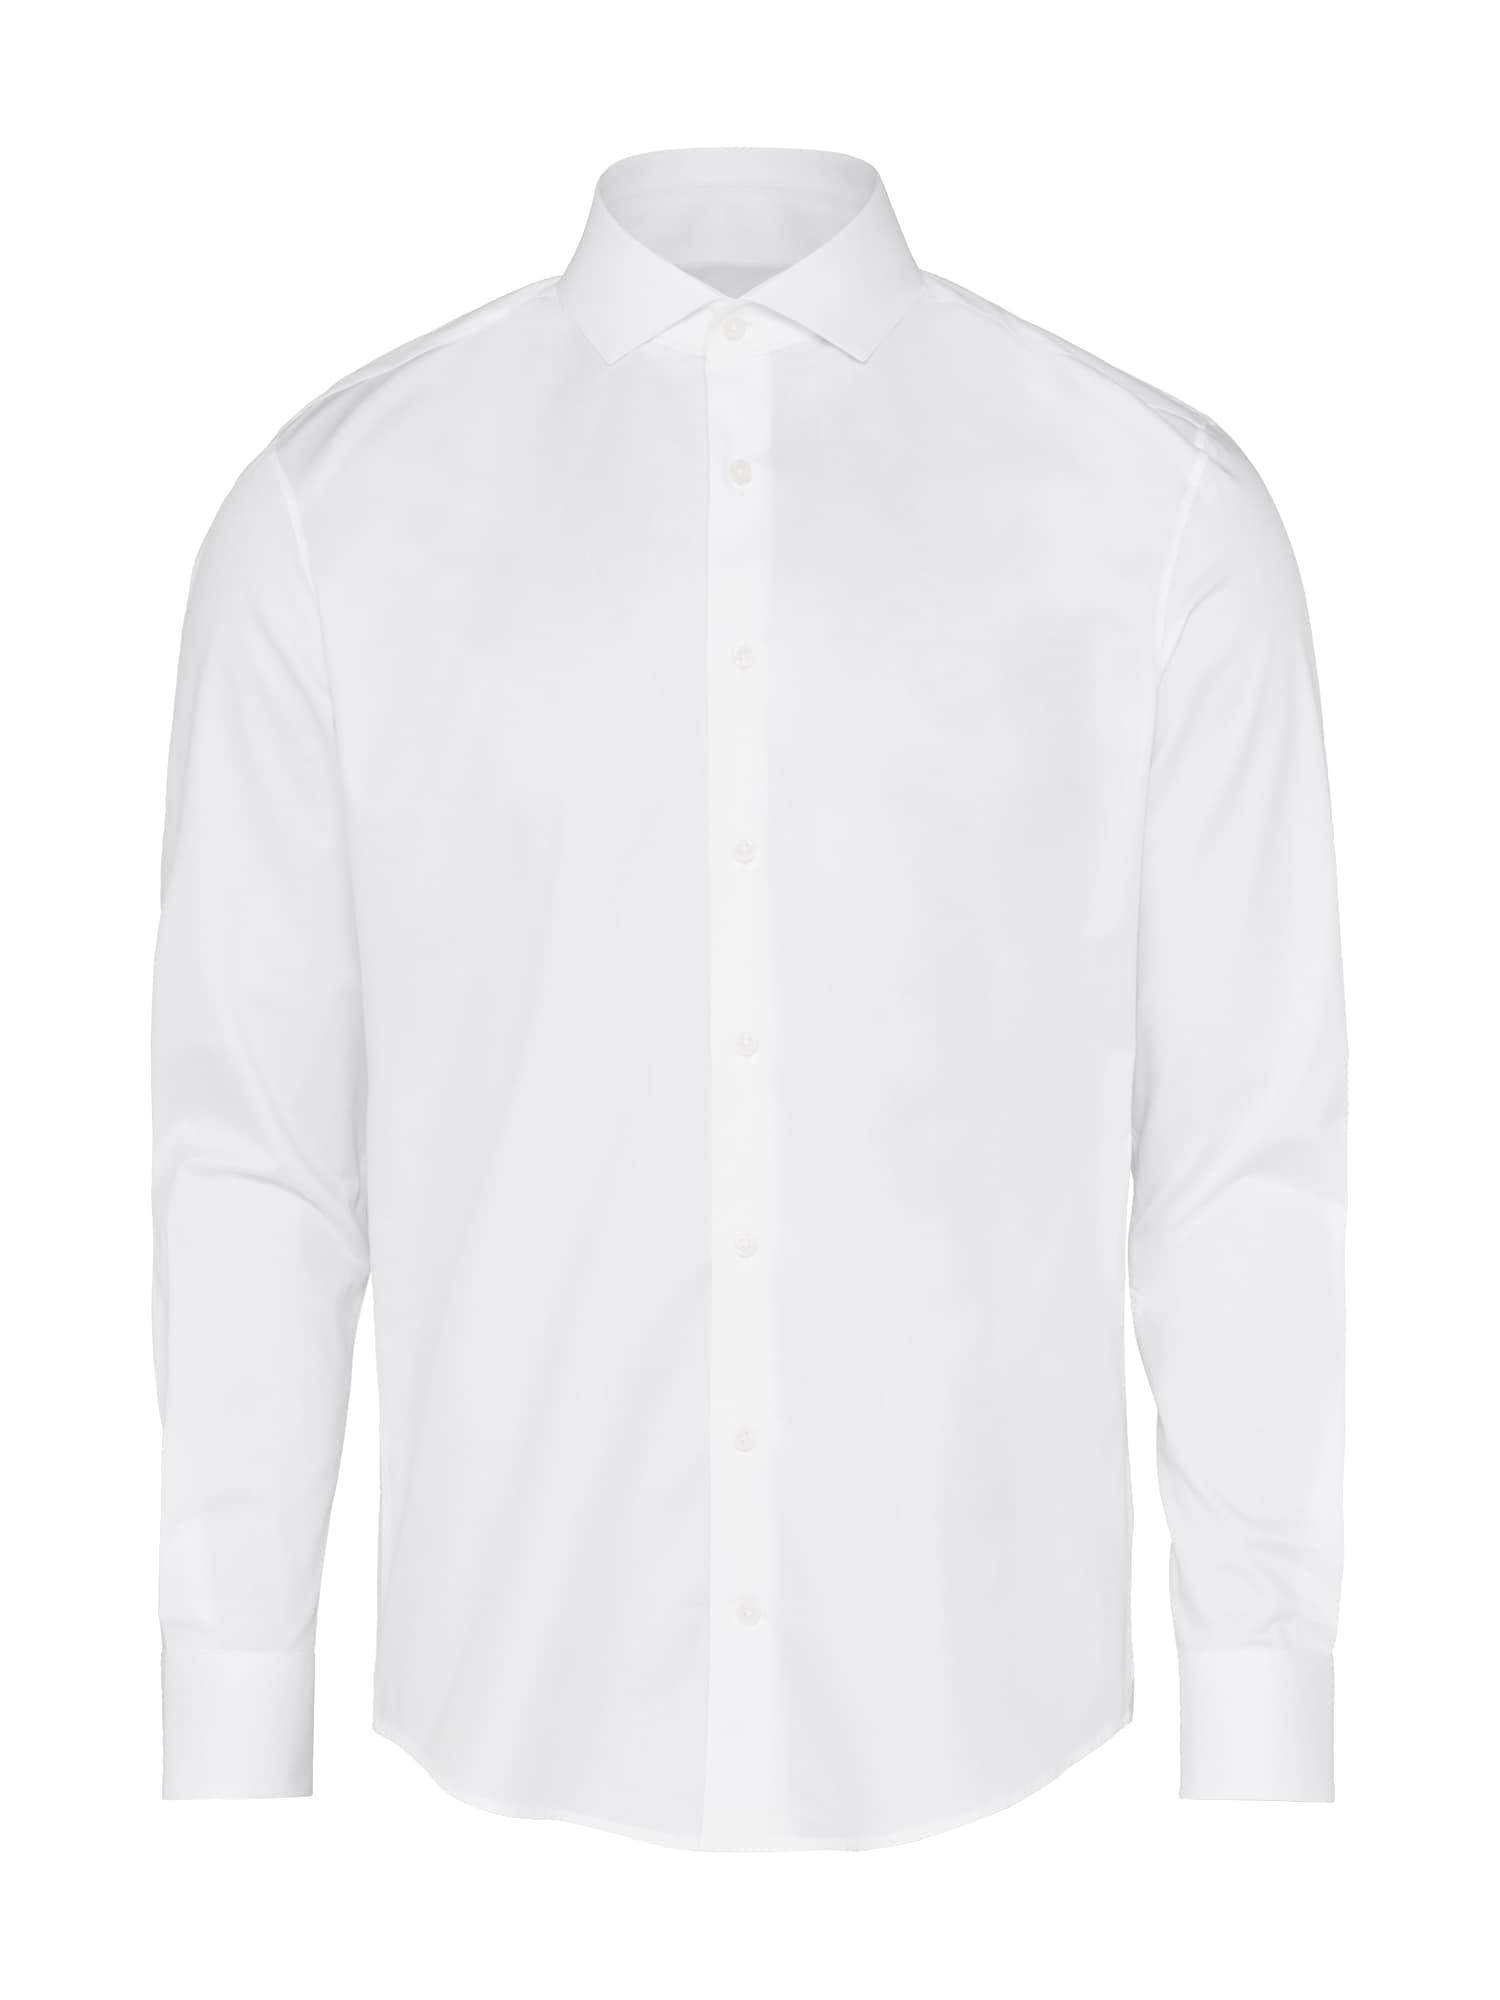 Společenská košile ELIAS bílá DRYKORN